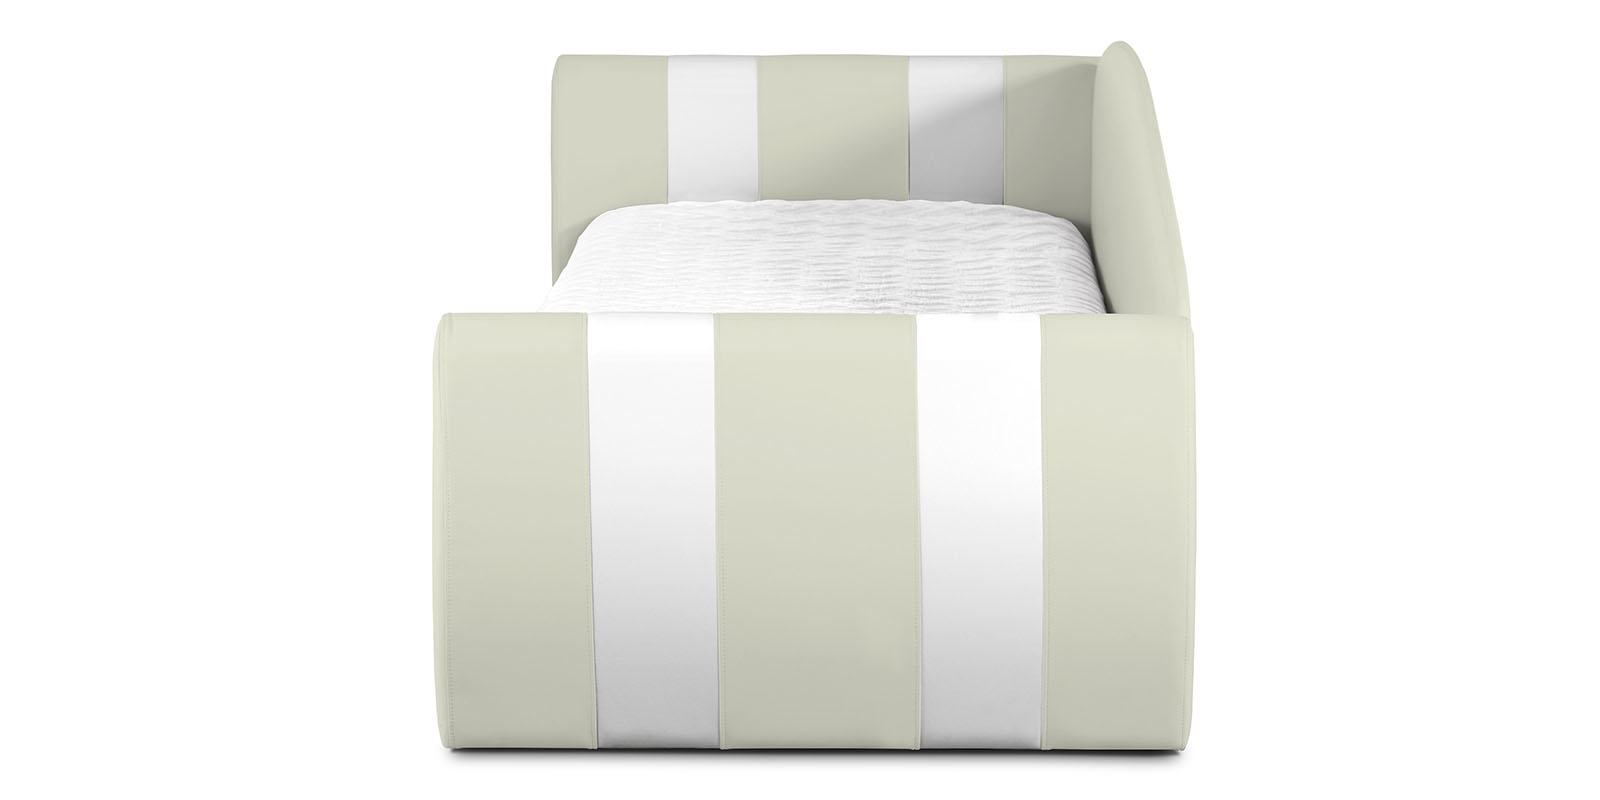 Мягкая кровать 190х90 Монако угол левый (молочный/белый) от HomeMe.ru